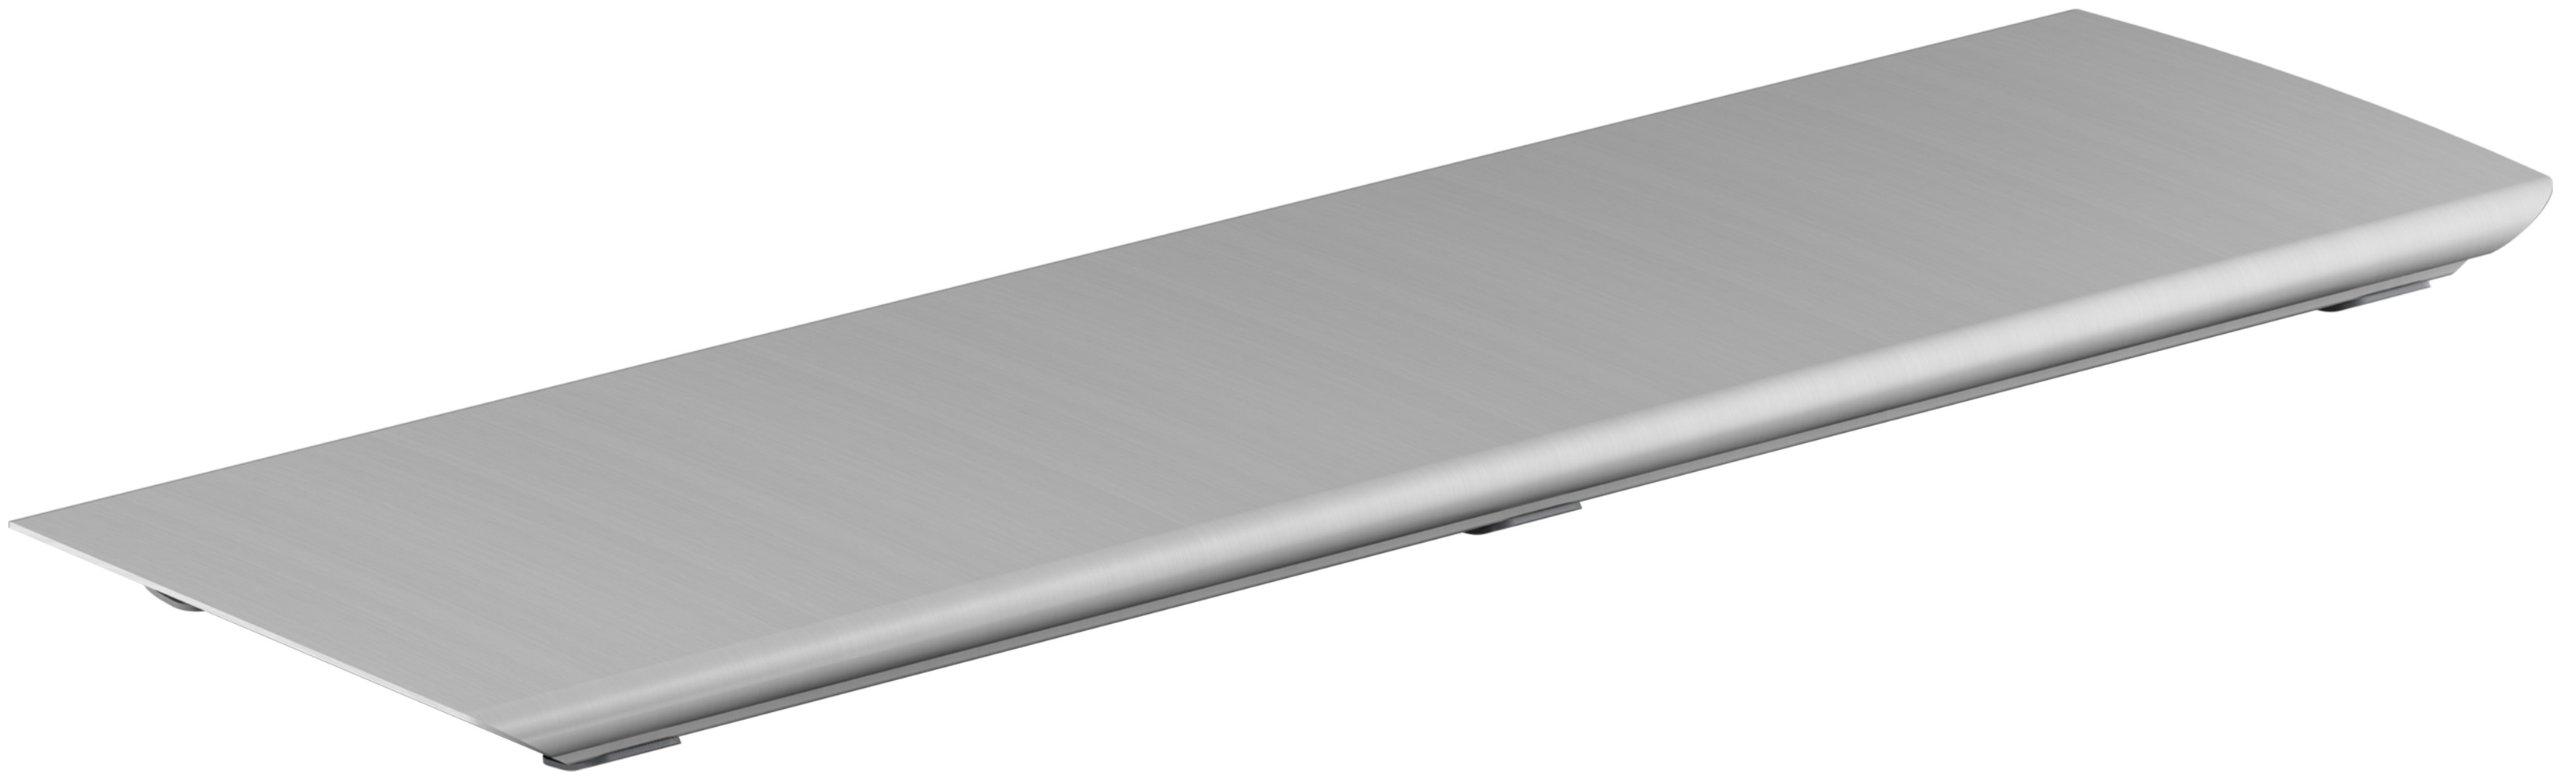 KOHLER K-9156-NX Bellwether Aluminum Drain Cover for 60-Inch x 32-Inch Shower Base, Brushed Nickel